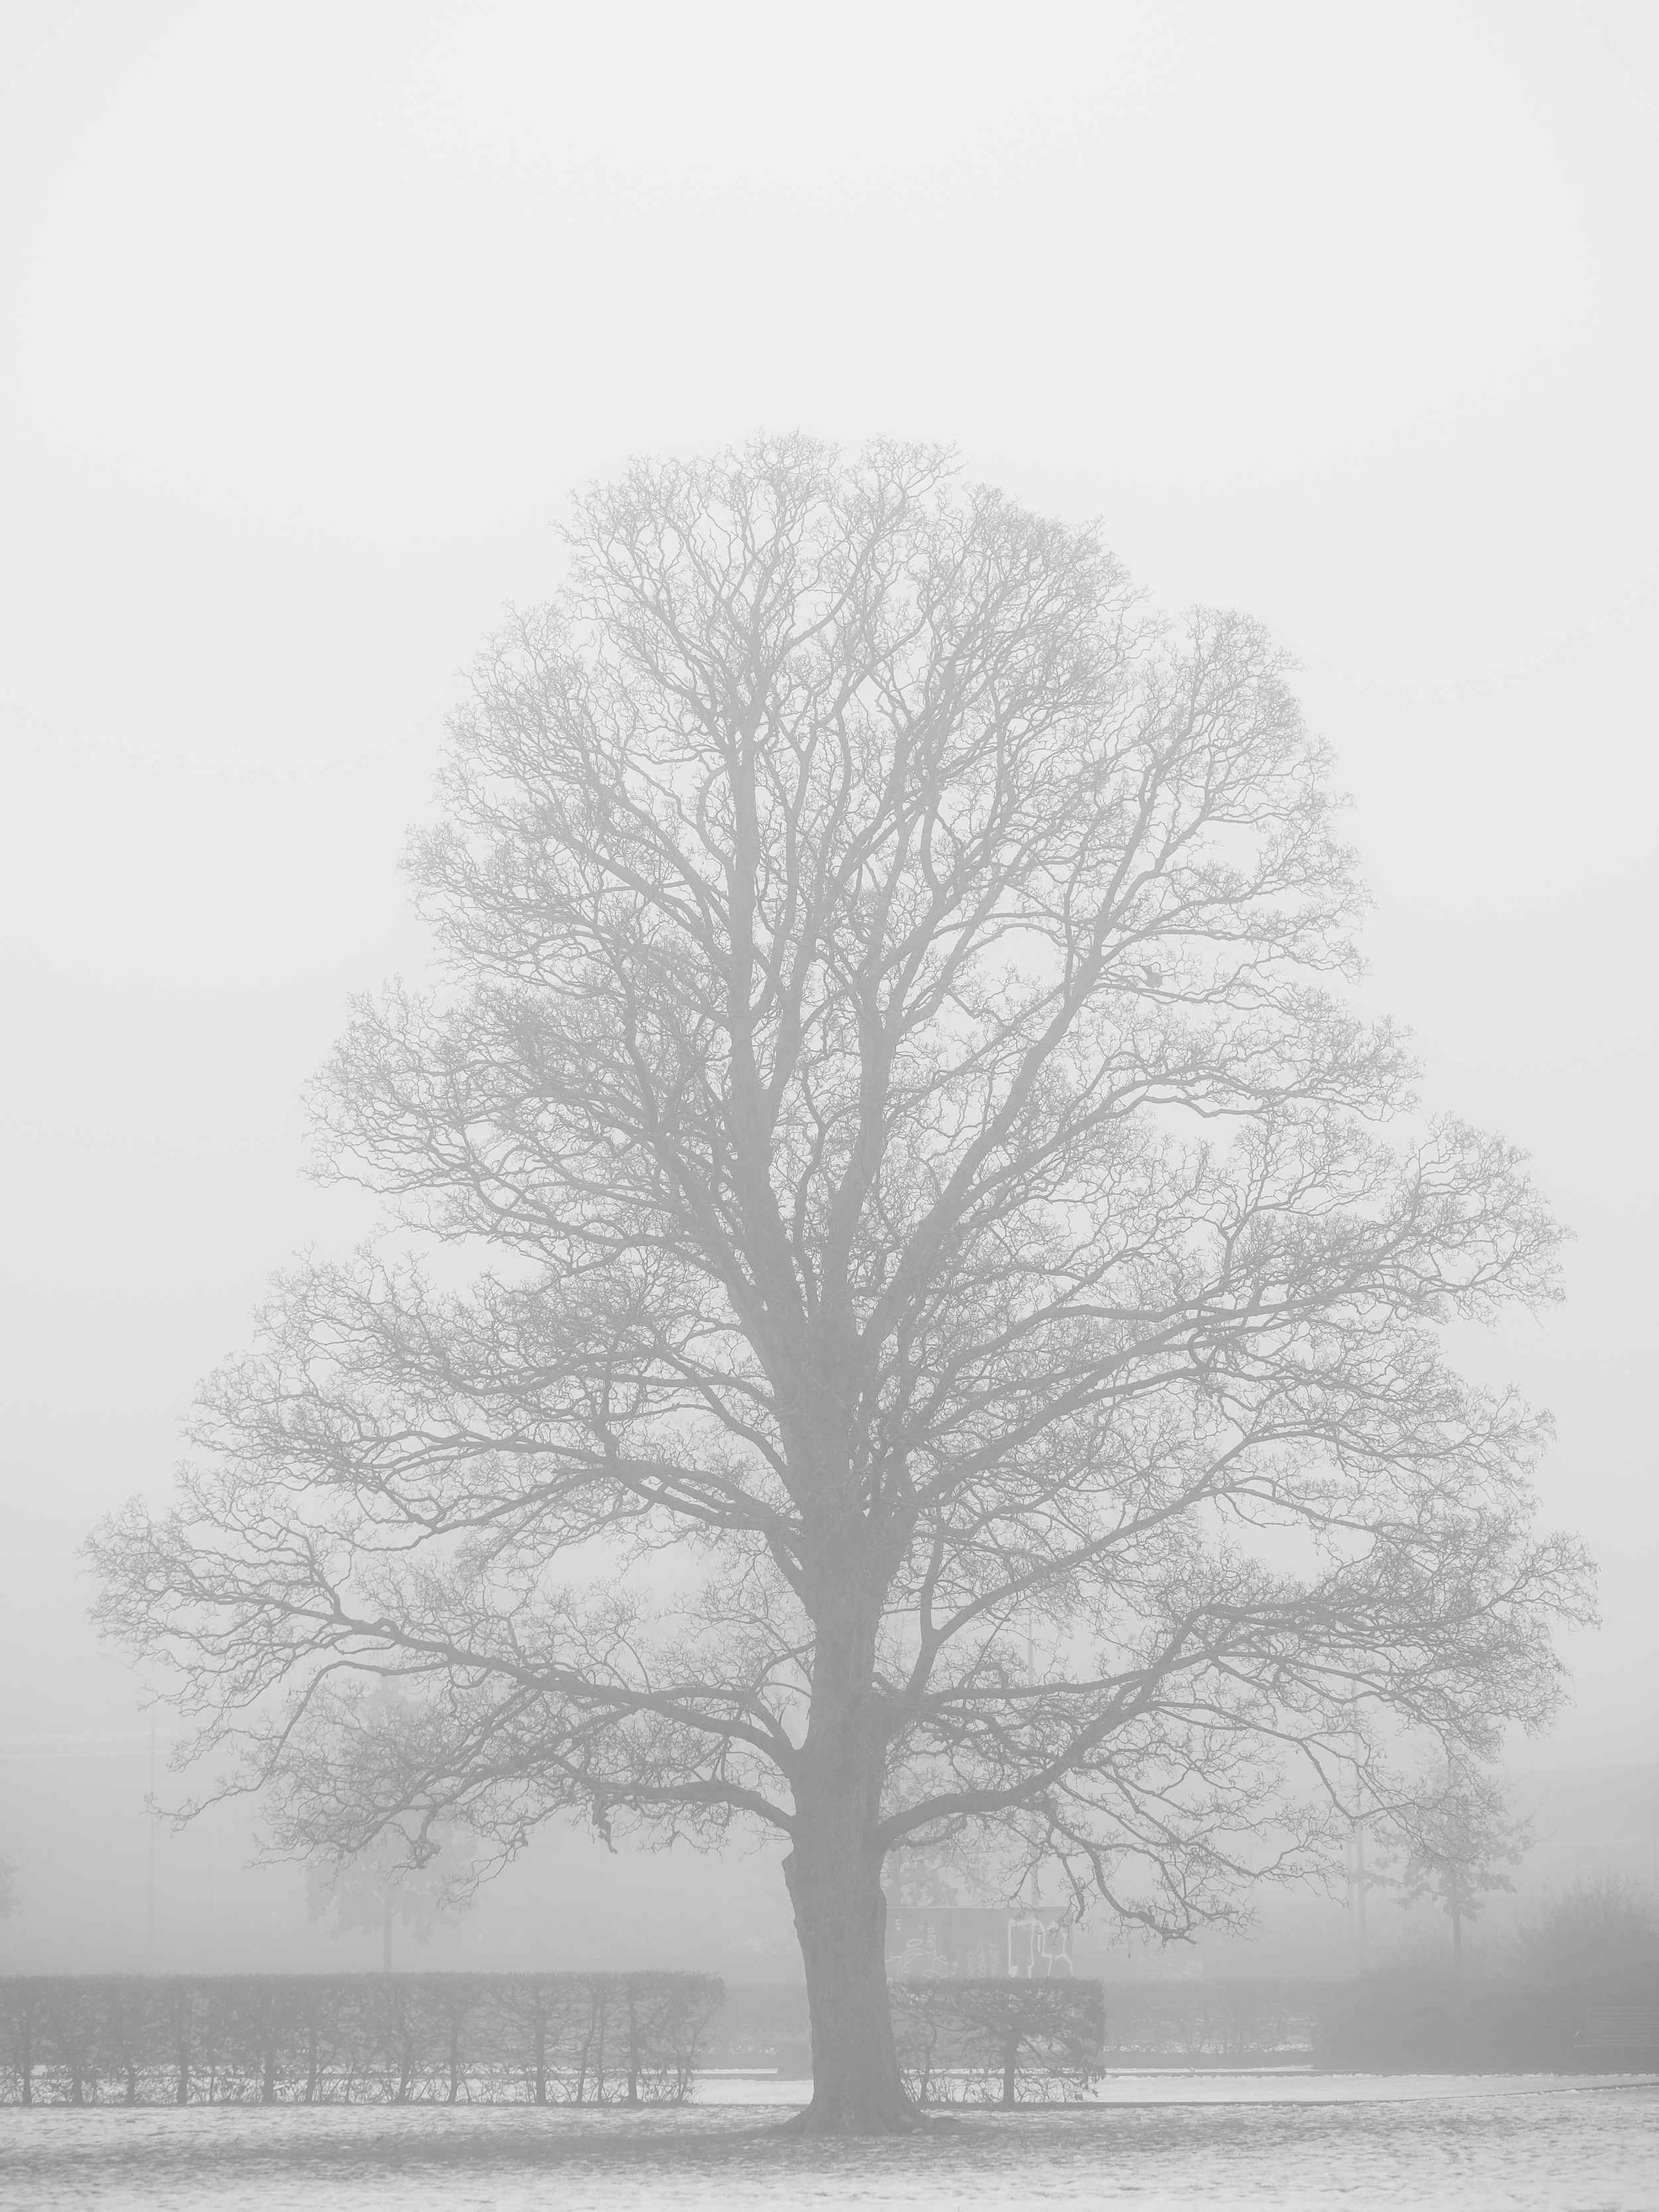 Winterfog-7274.jpg